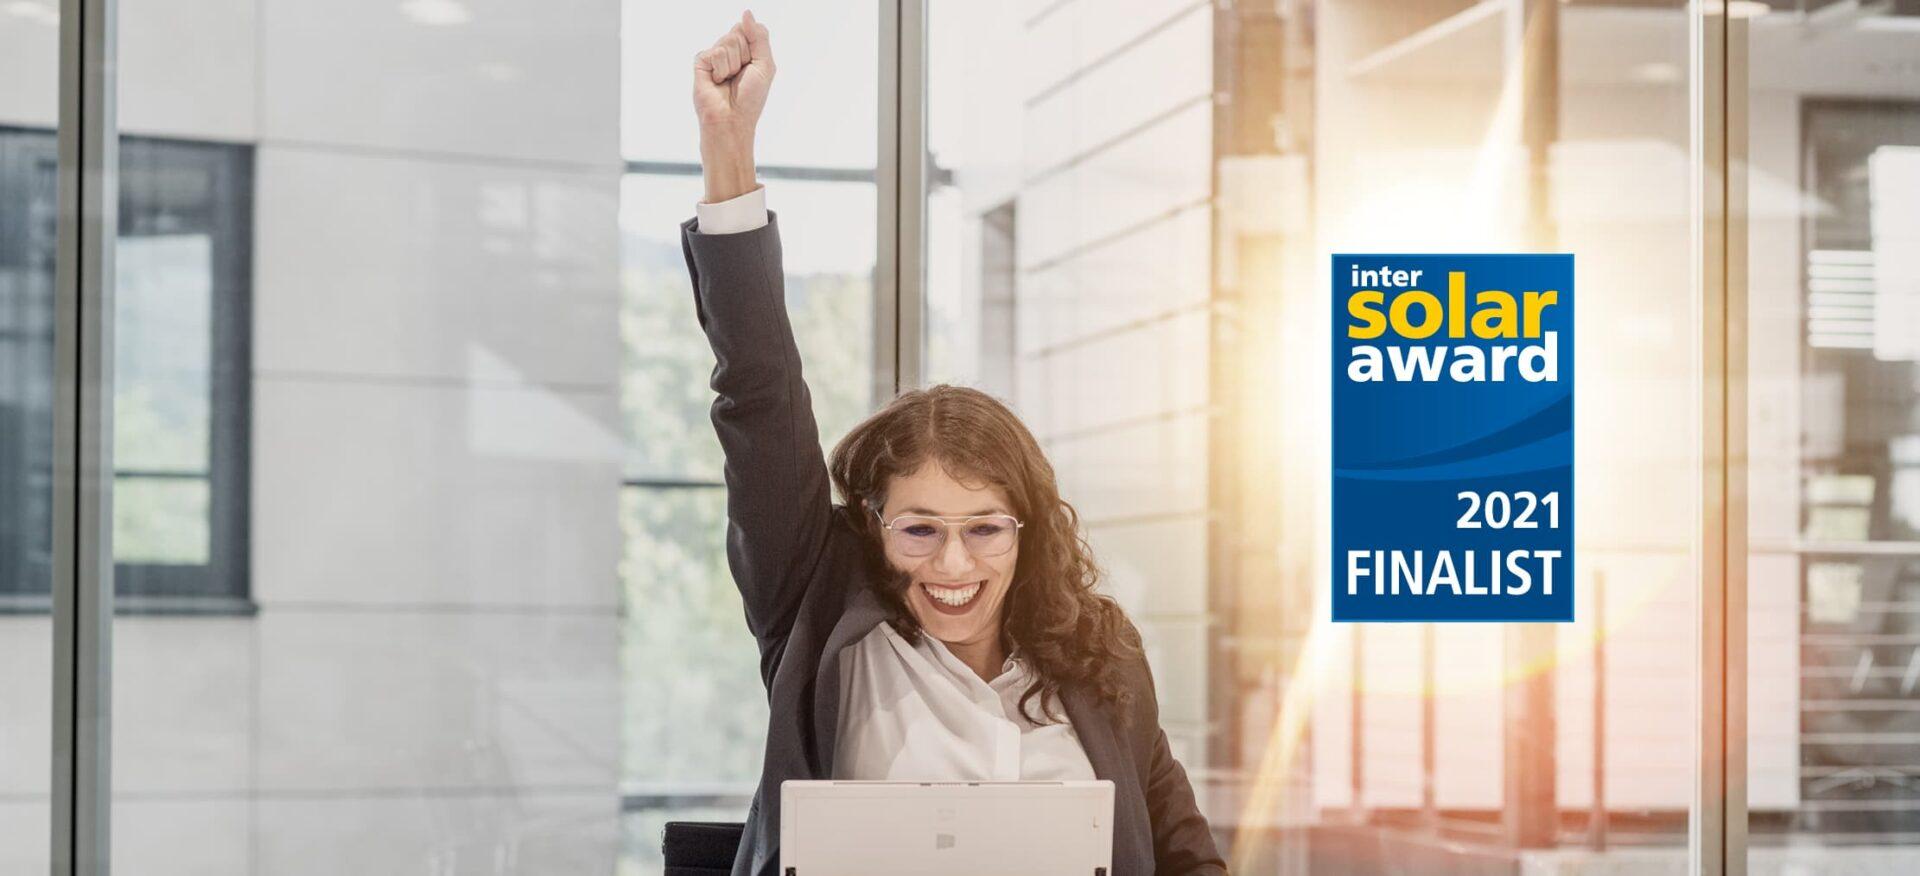 Goldbeck Solar ist Finalist beim Intersolar Award 2021